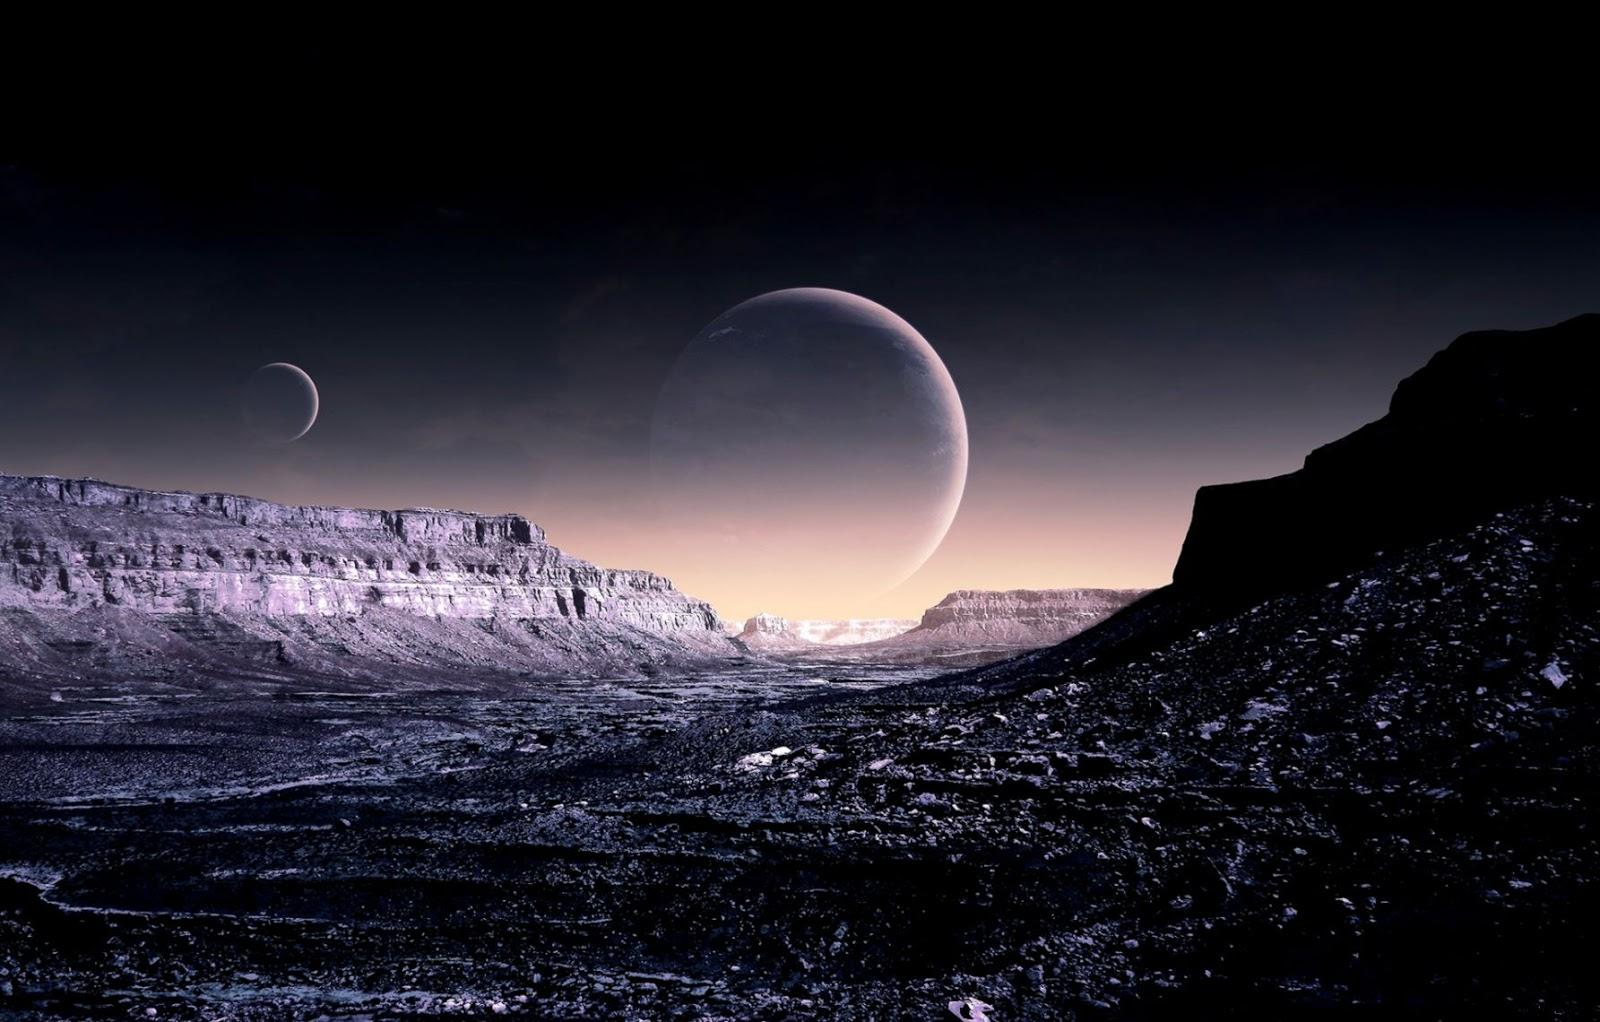 Space Star Wars Fiction Planet Wallpaper High Definitions Star Wars Planet Background 1600x1022 Download Hd Wallpaper Wallpapertip